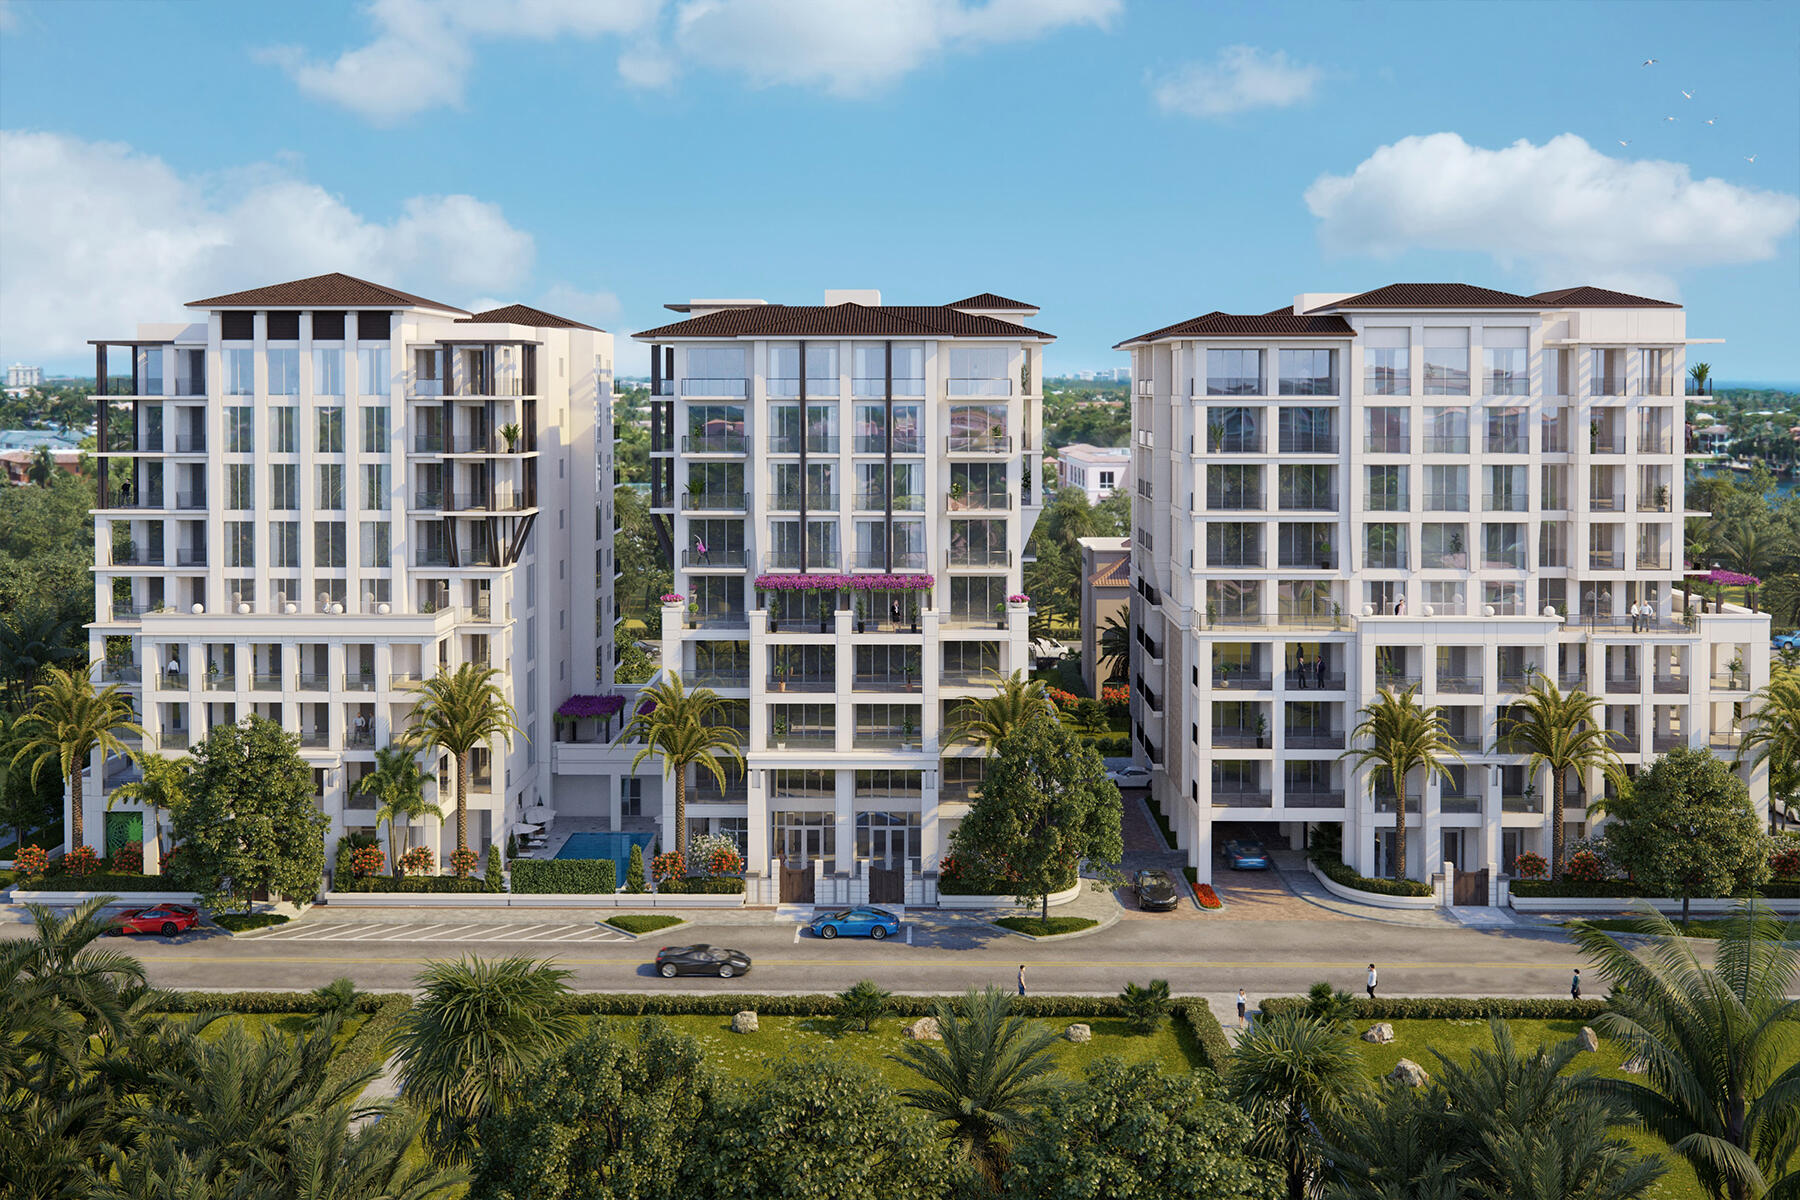 1.Royal-Palm-Residences-Exterior-Render-